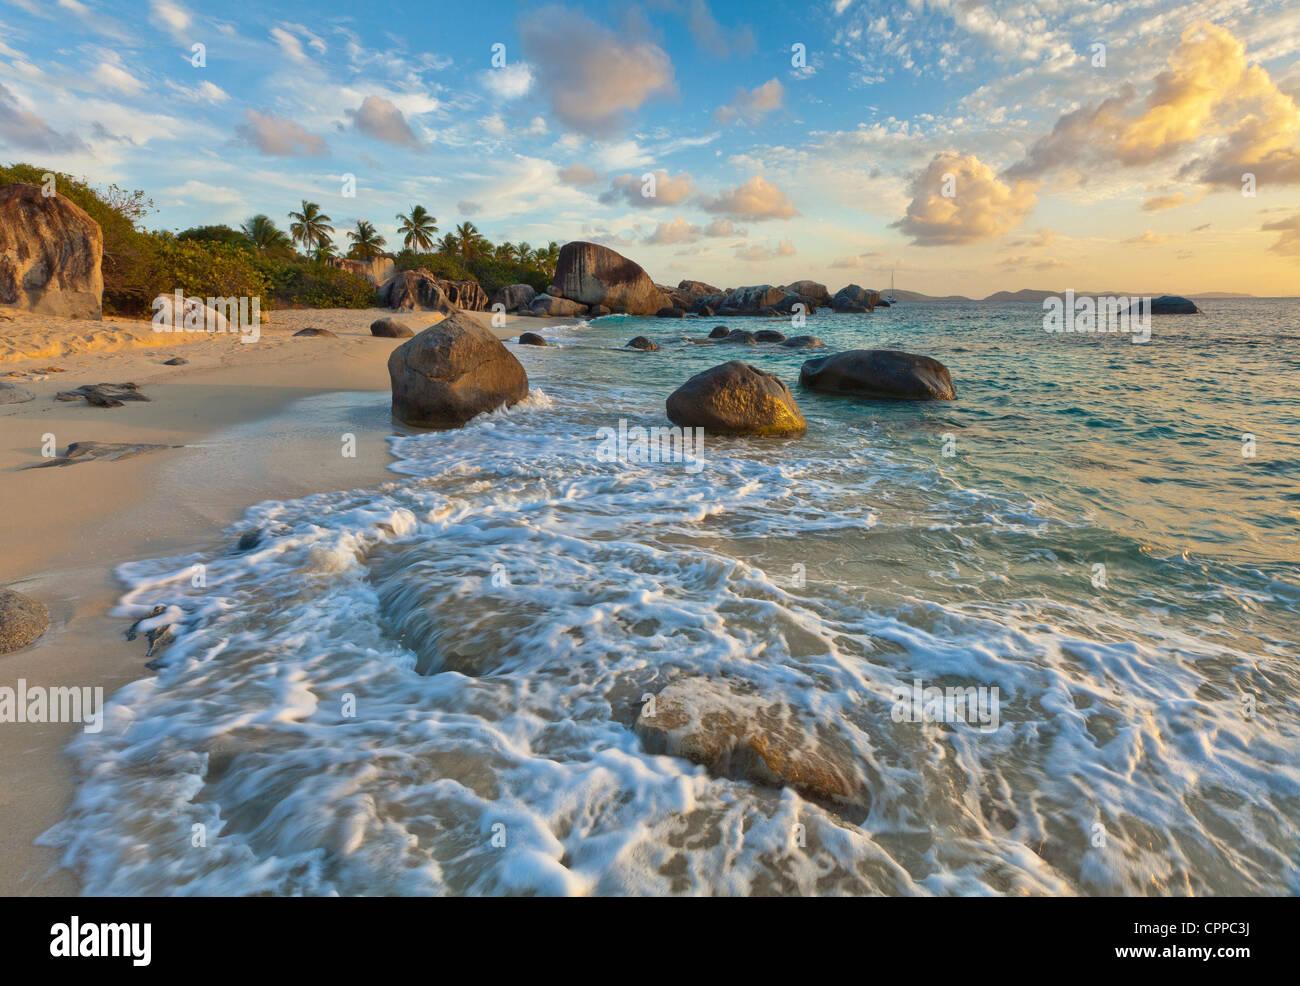 Virgin Gorda, British Virgin Islands, Caribbean Evening light on the surf and rock patterns on the beach of Little - Stock Image